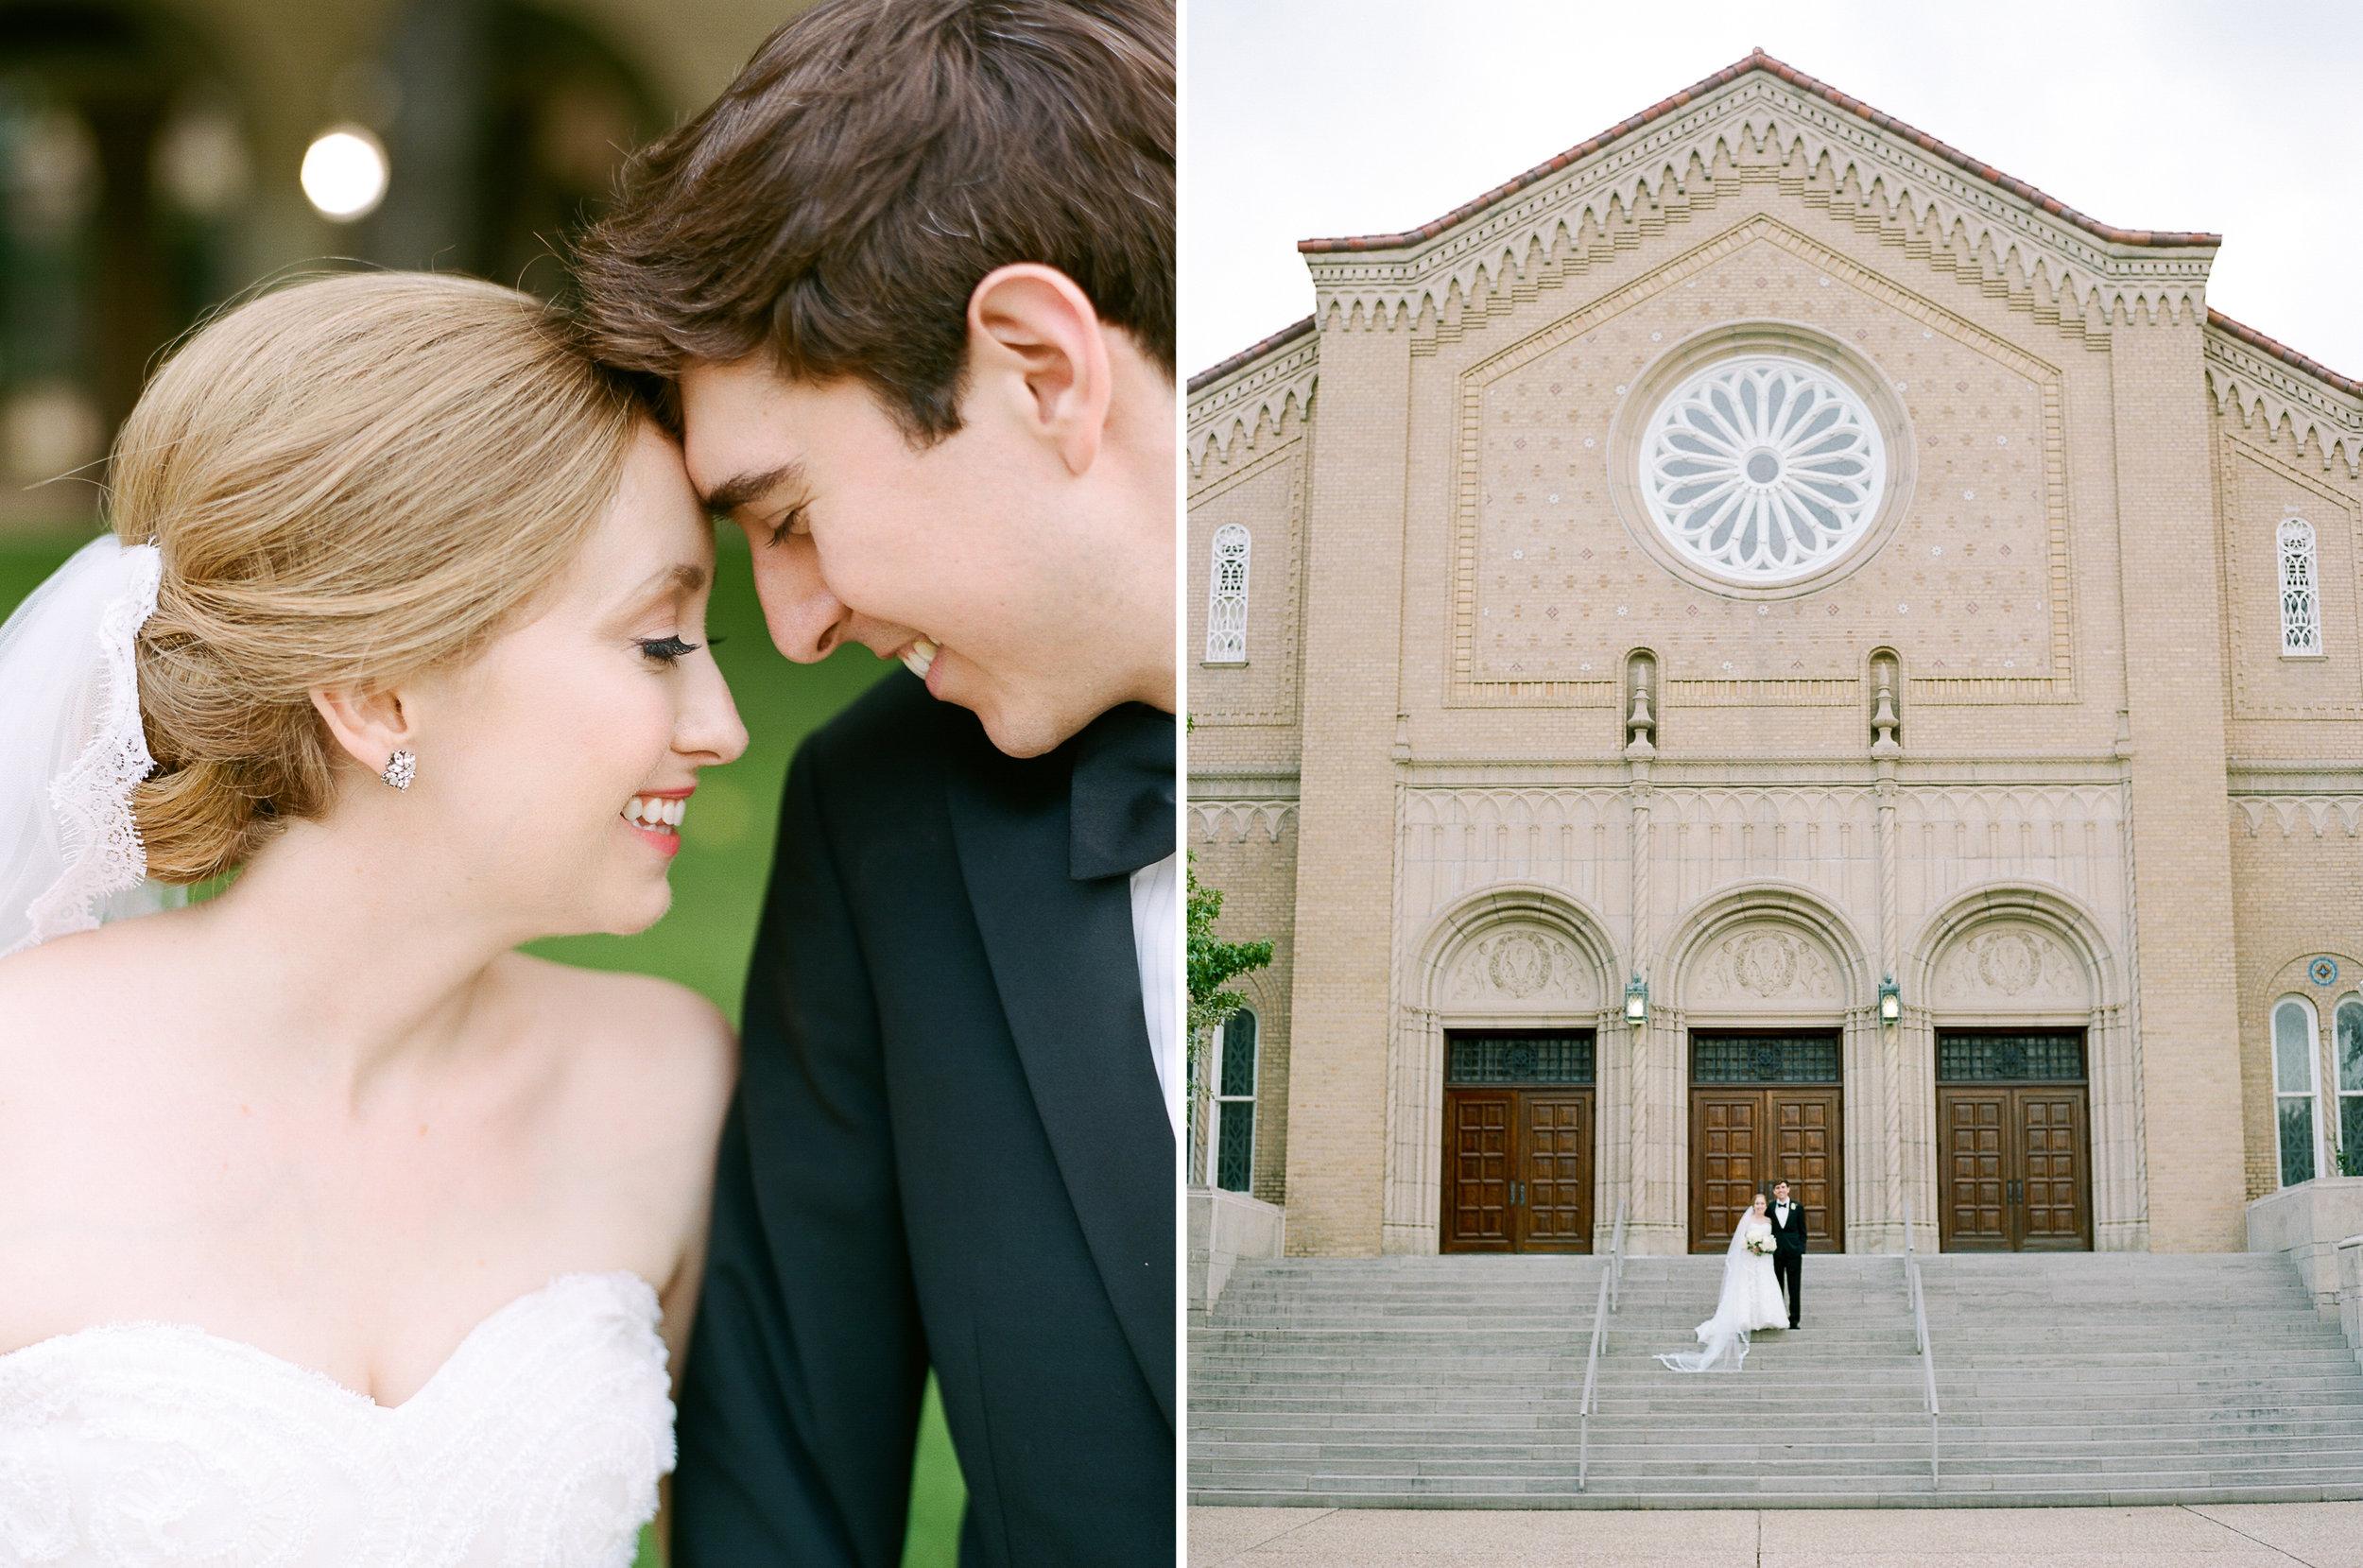 Fine-Art-Film-Houston-Wedding-Photographer-Best-Top-Luxury-Texas-Austin-Dallas-Destination-Dana-Fernandez-Photography-River-Oaks-Country-Club-South-Main-Baptist-Ceremony-Reception-Wedding-131.jpg